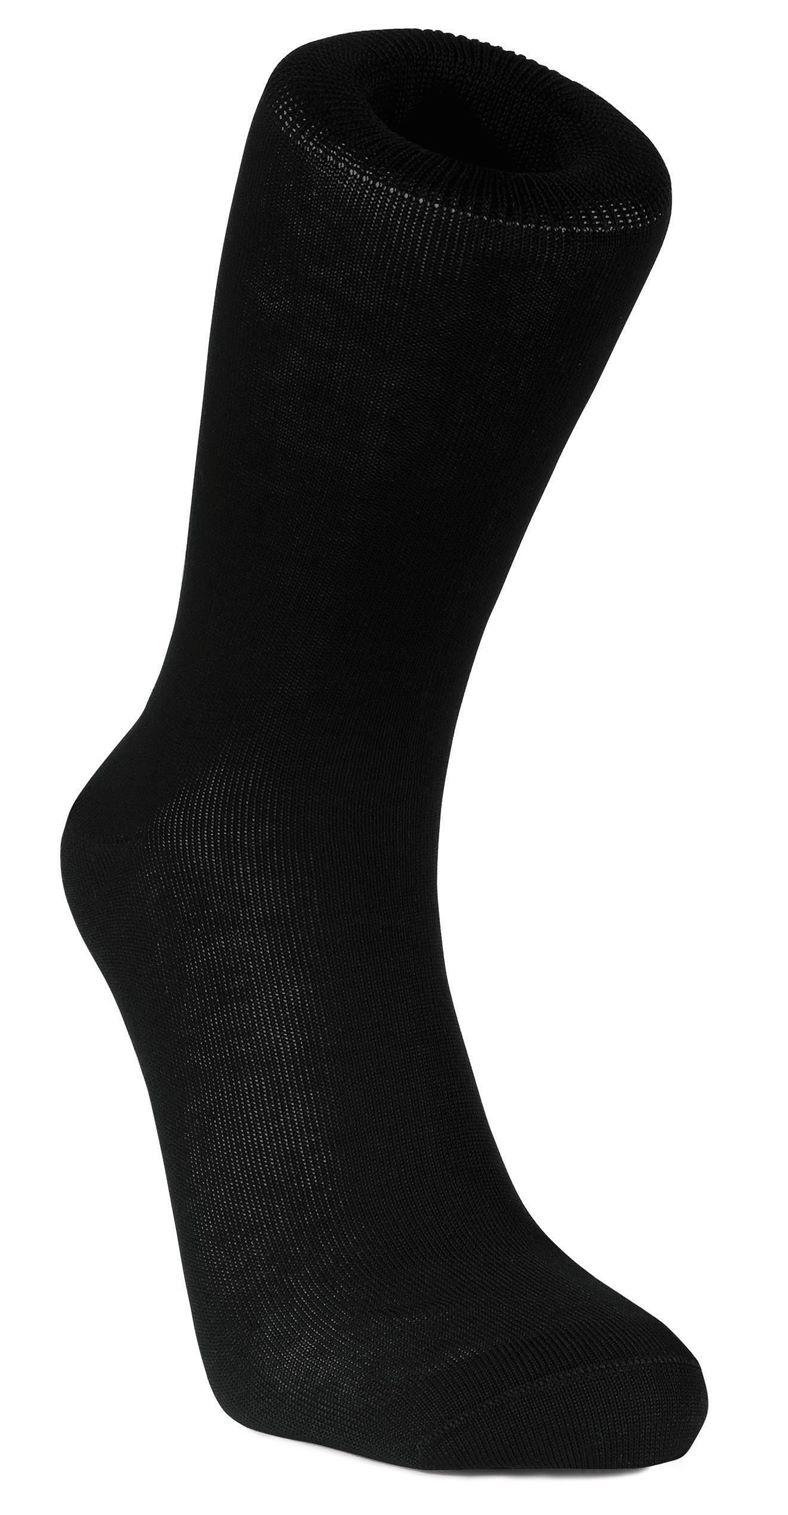 Mens Business Sock Cotton (Nero)